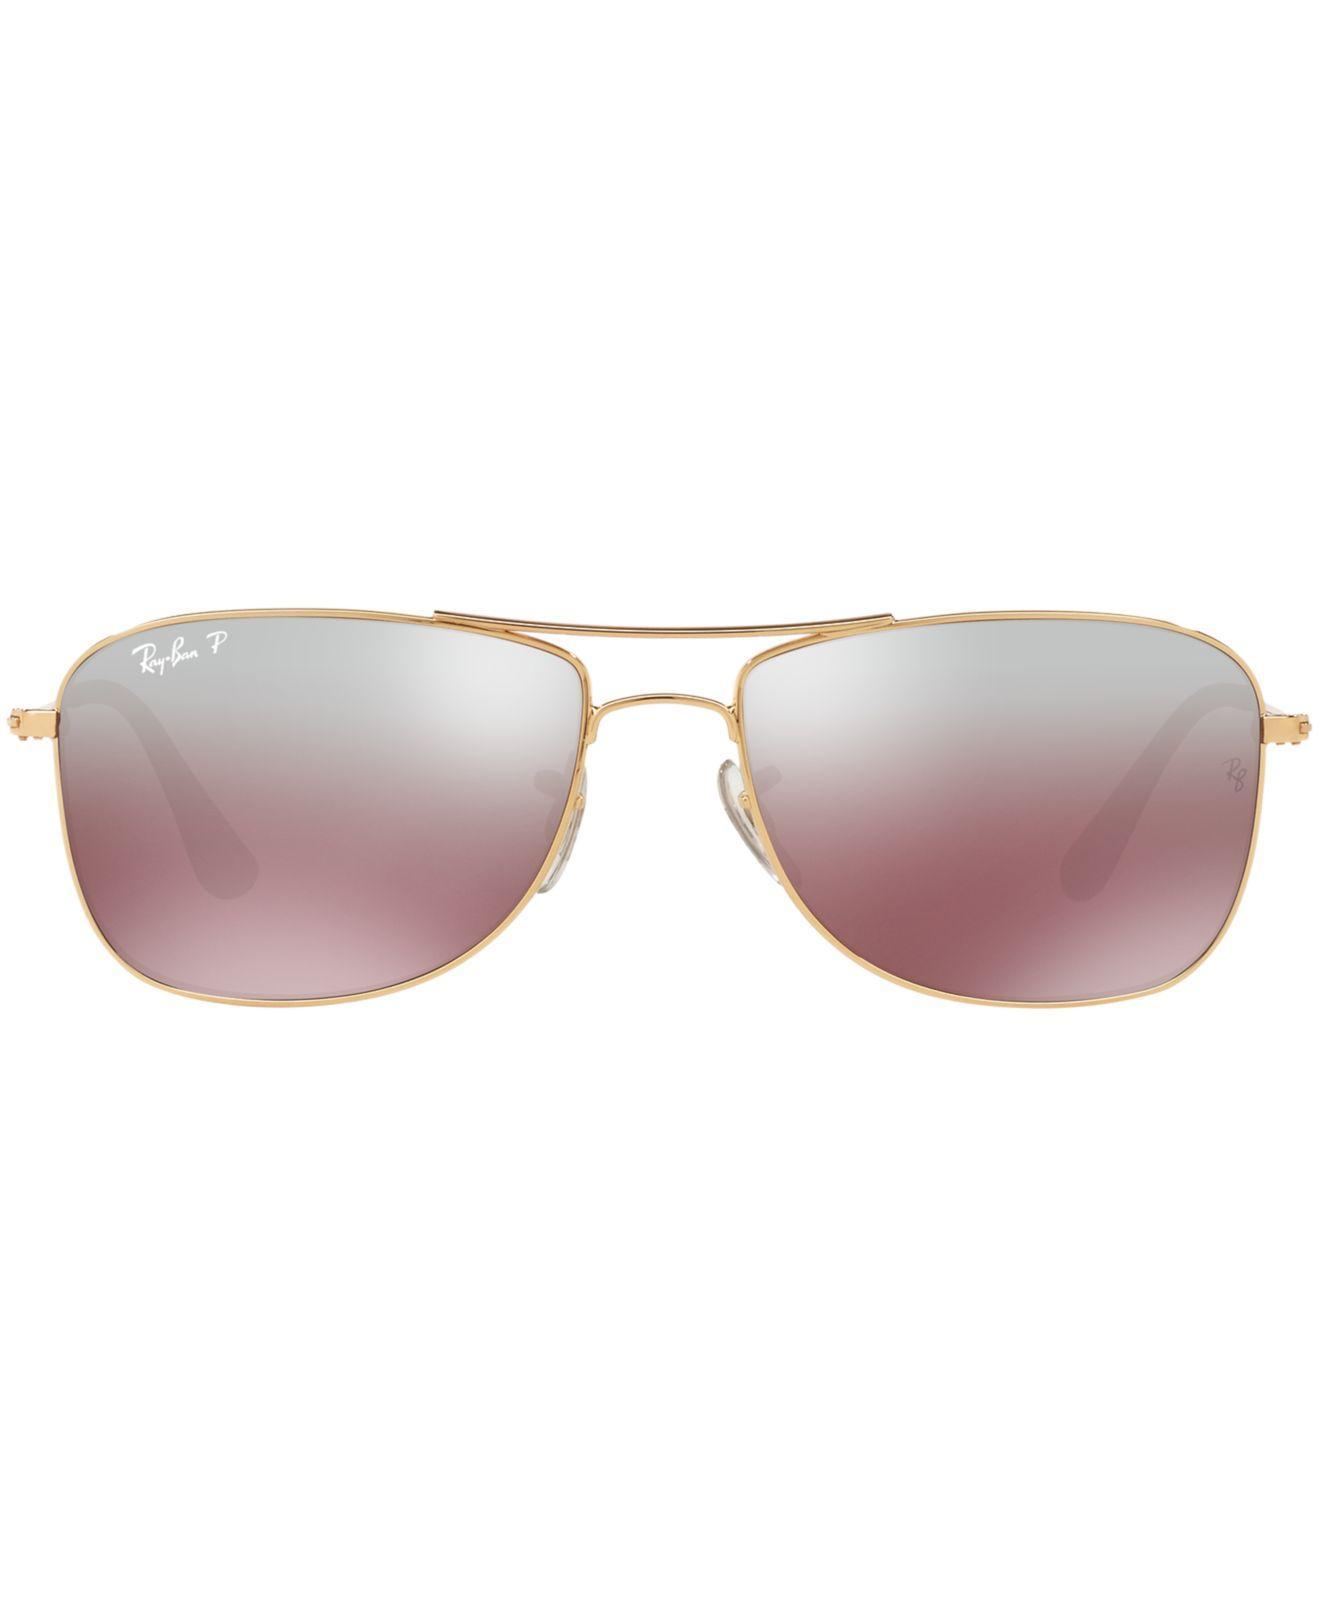 f4919275b8 Lyst - Ray-Ban Sunglasses